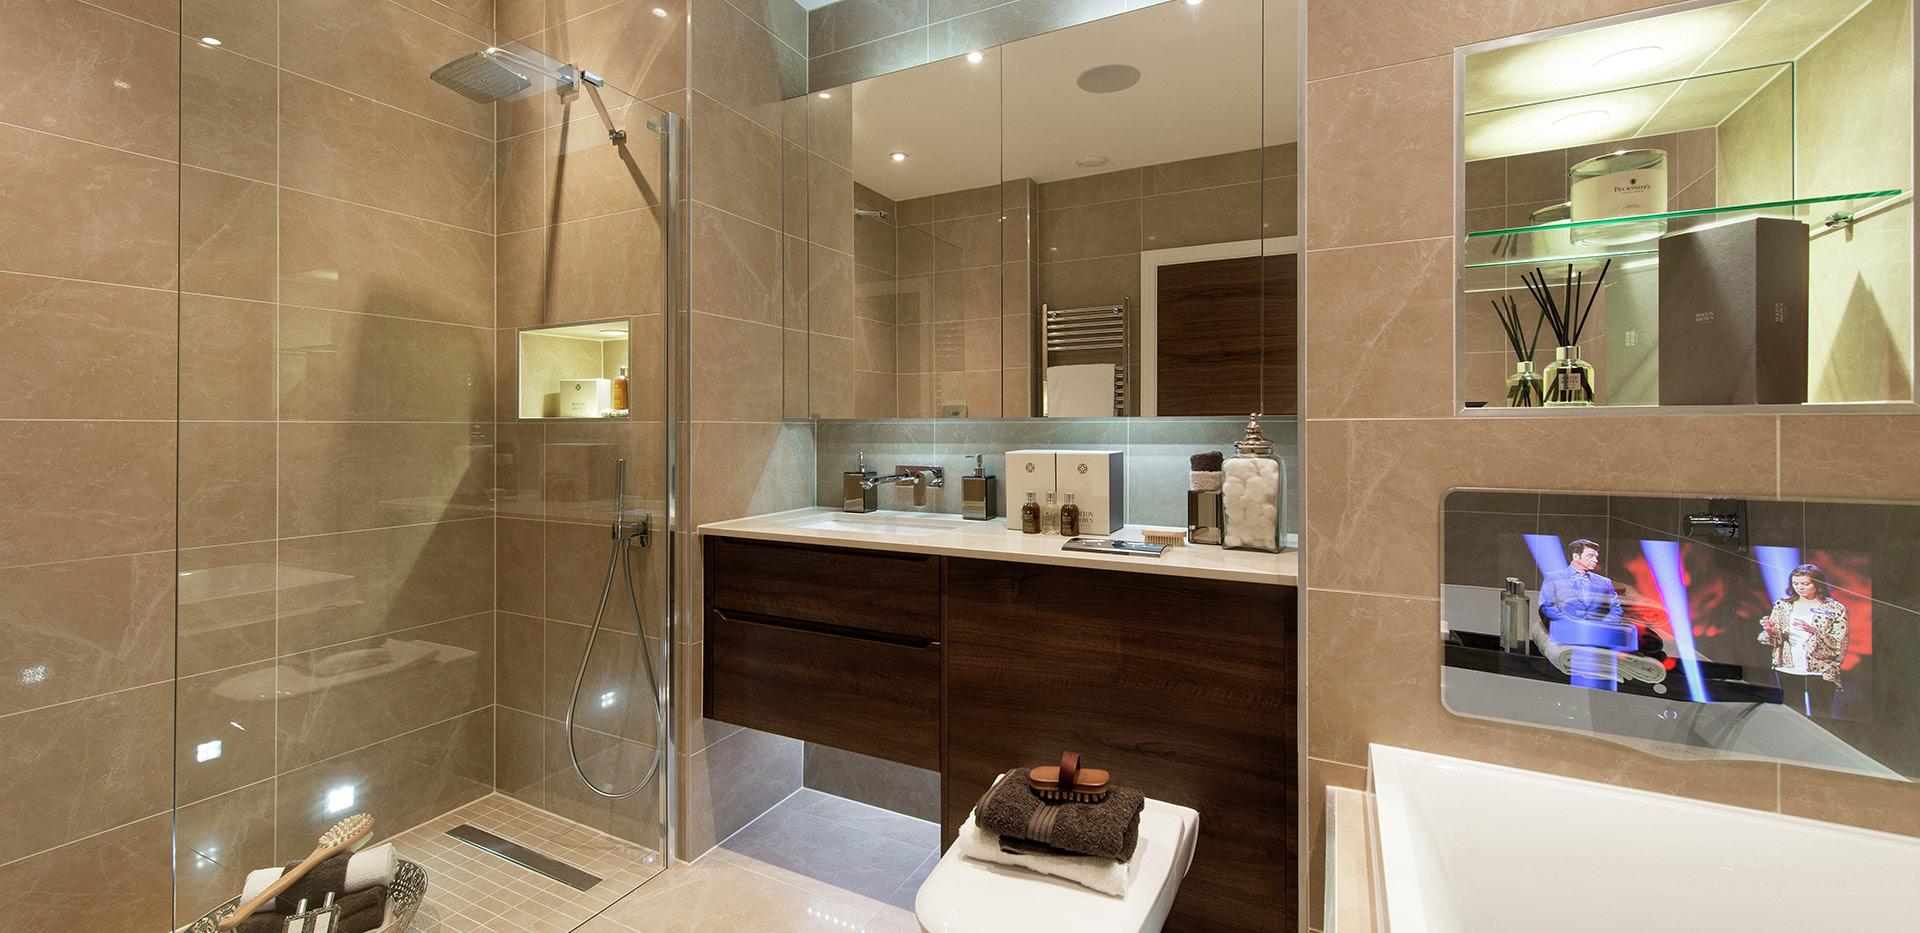 Berkeley, St Josephs Gate, Show Apartment, Master Ensuite, Bathroom, Interior